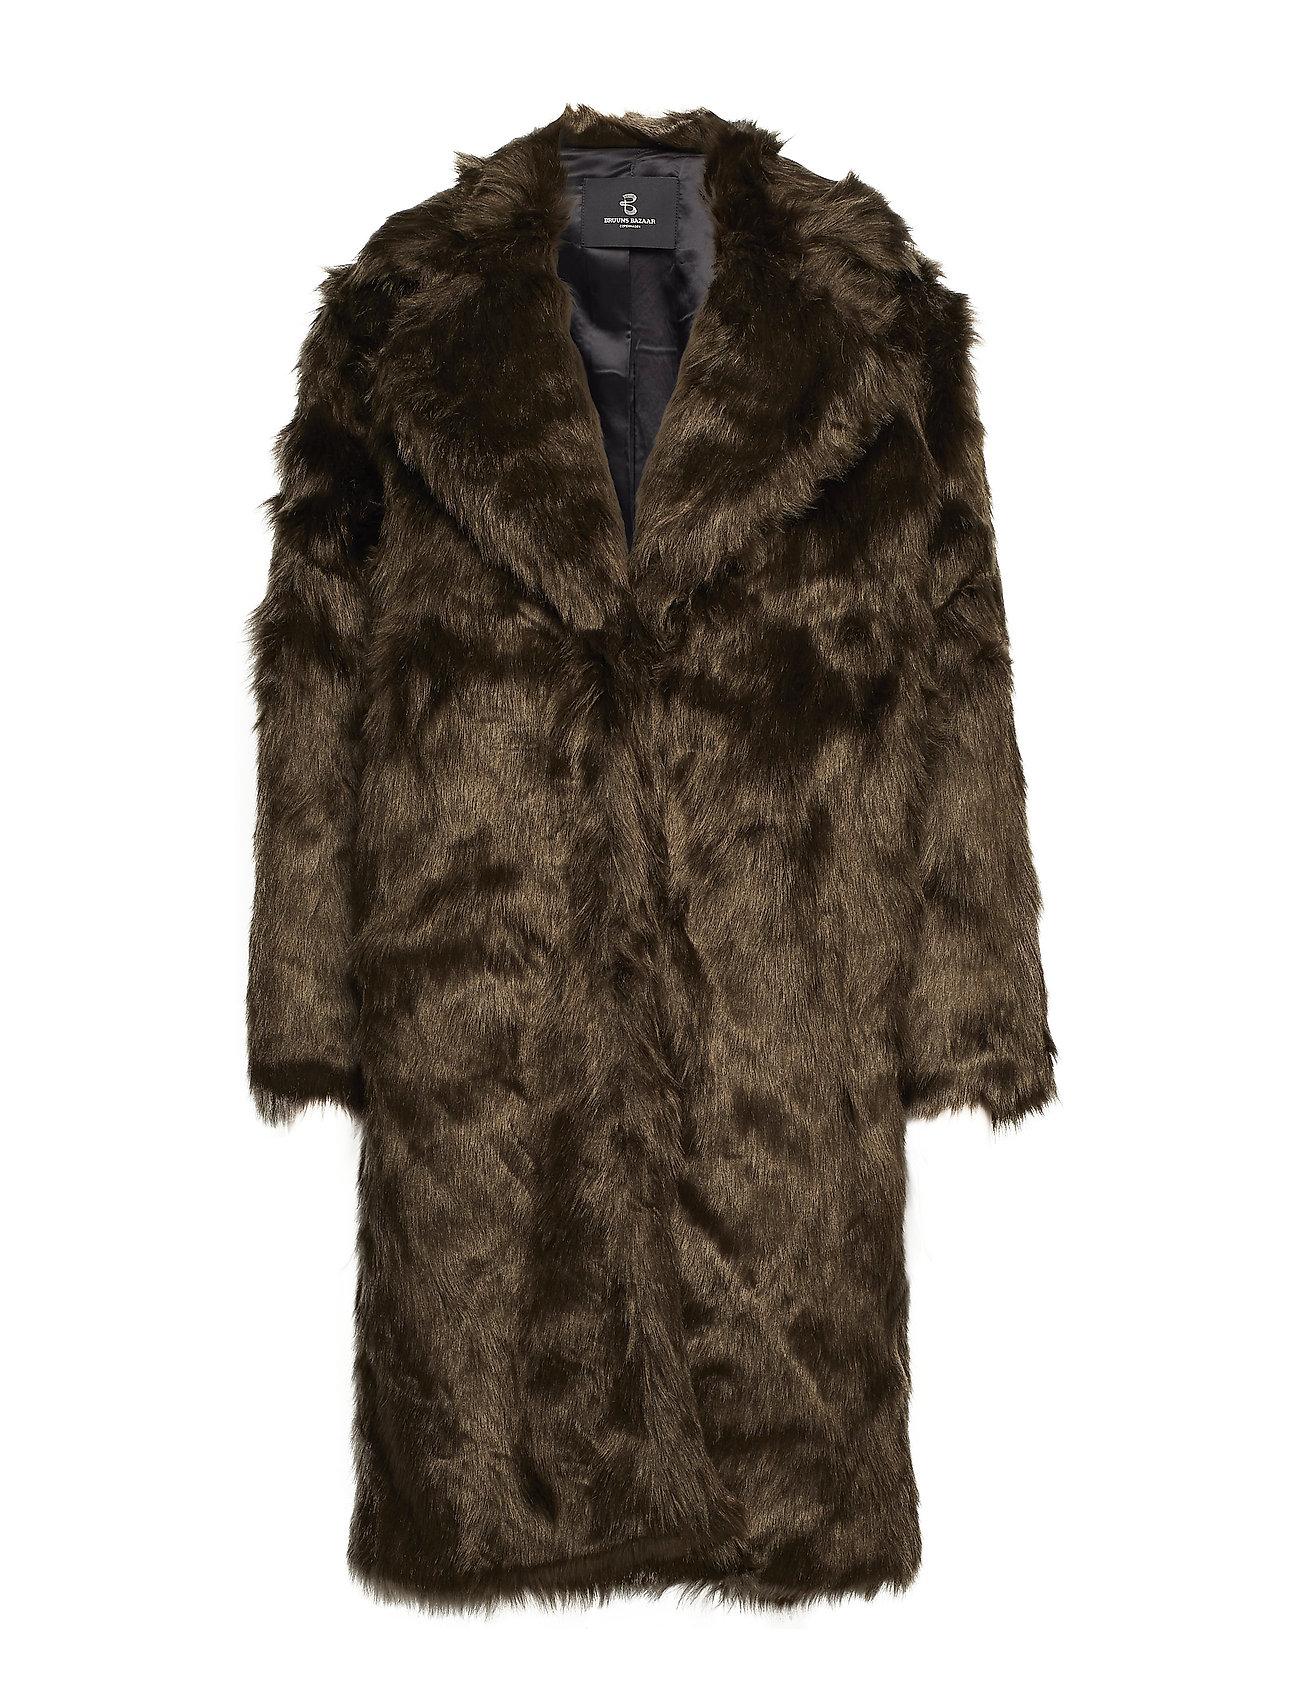 Bruuns Bazaar Abby Coraline Fur Coat - DARK BROWN